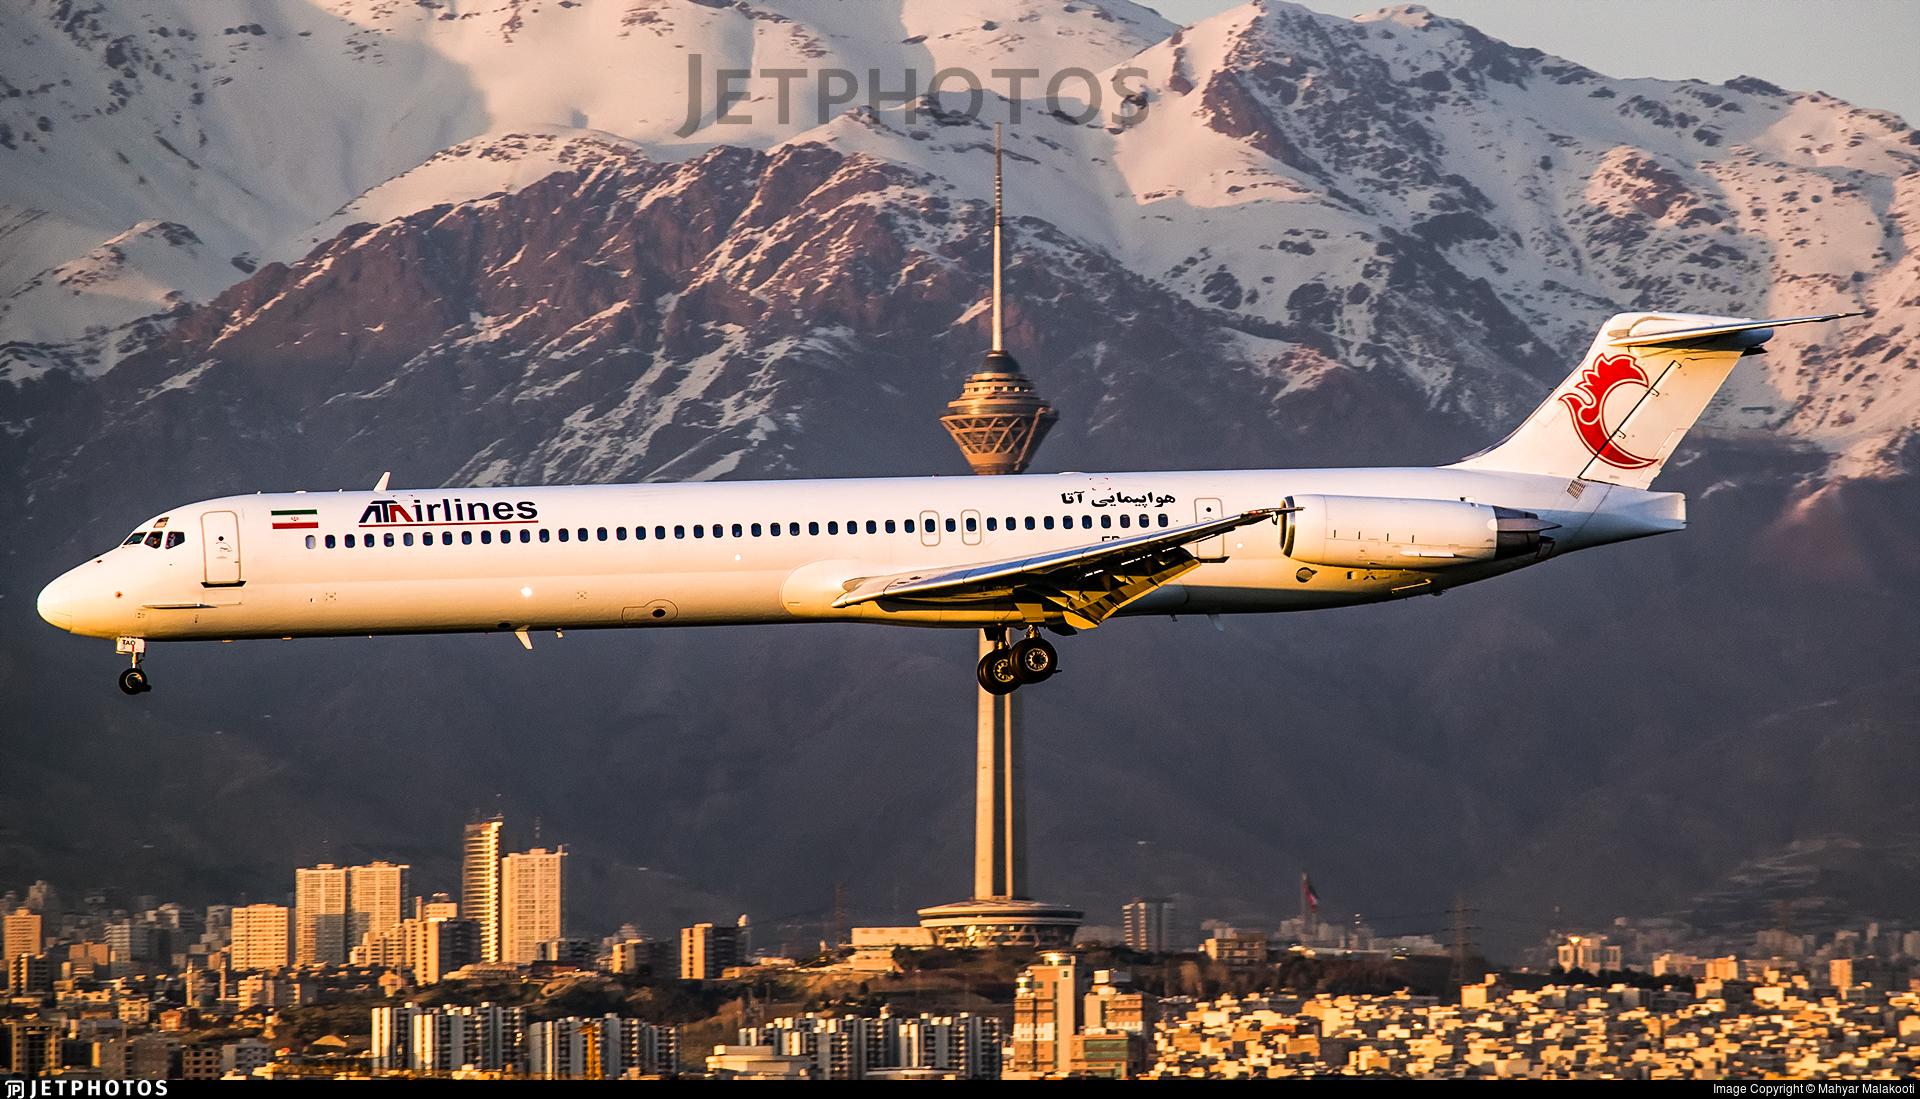 ATA Airlines Iran mountains terrain Tehran Iran MD-83